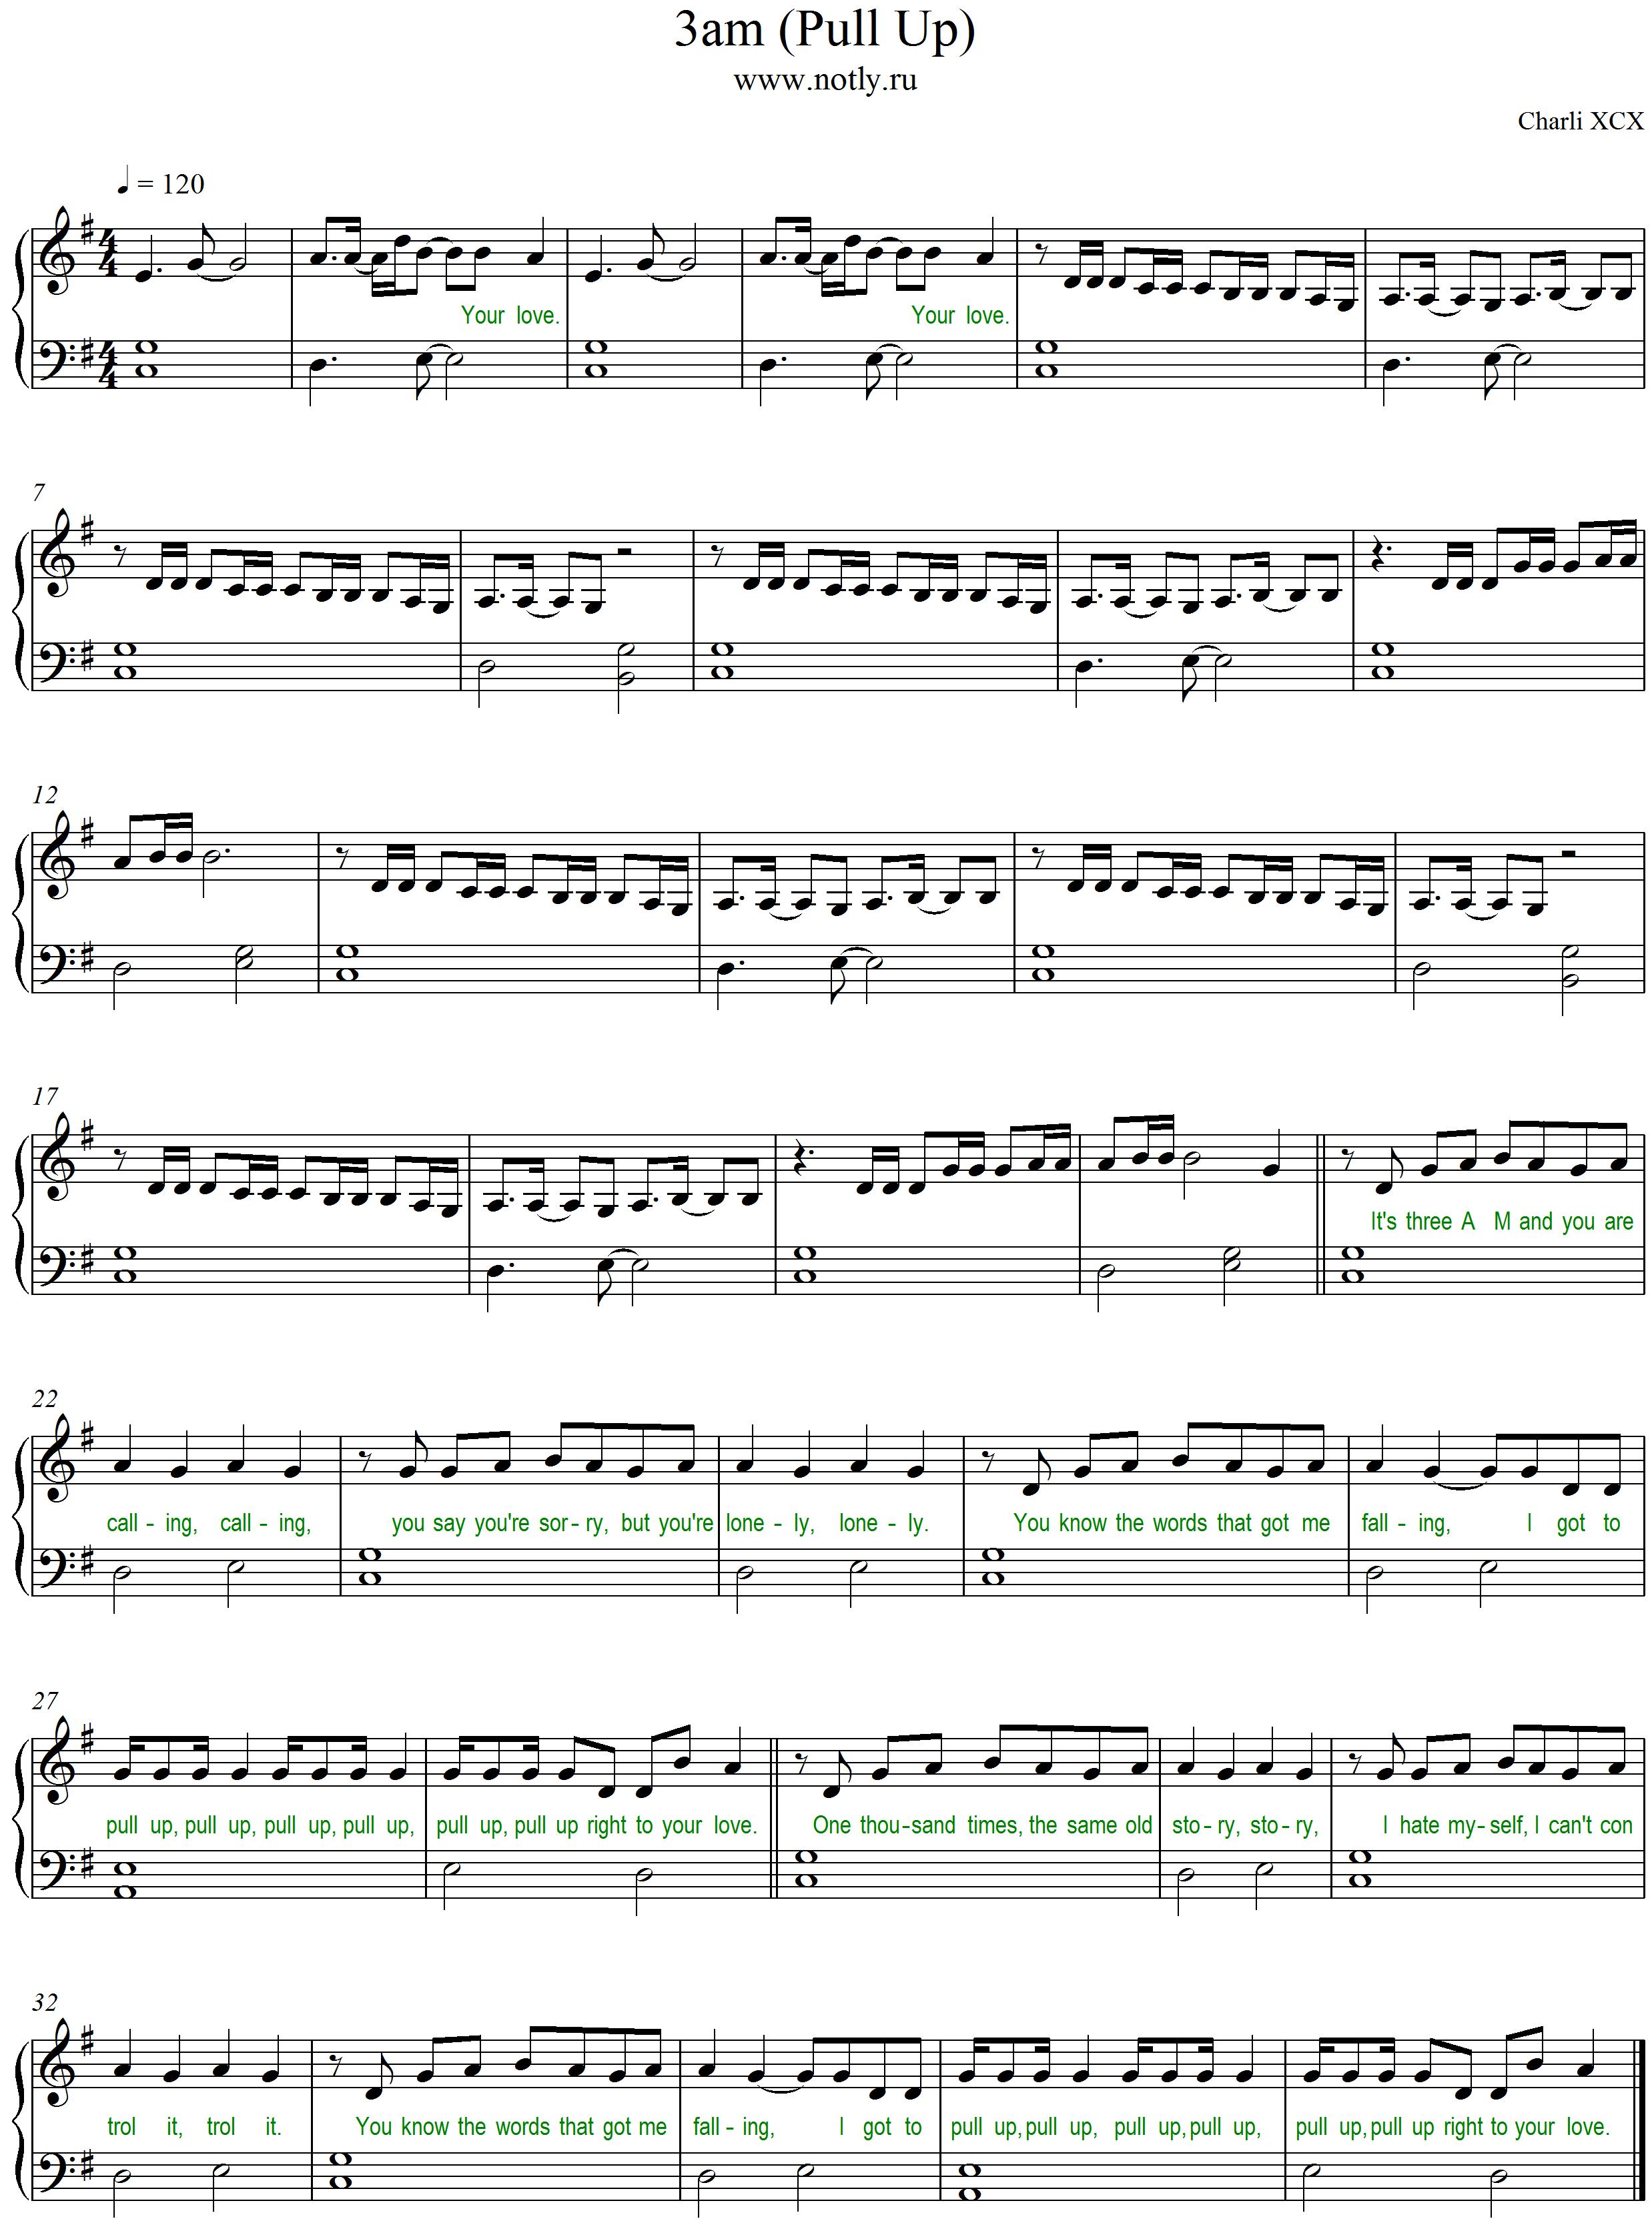 Download PDF Piano Sheet Music Charli XCX — 3am Pull Up